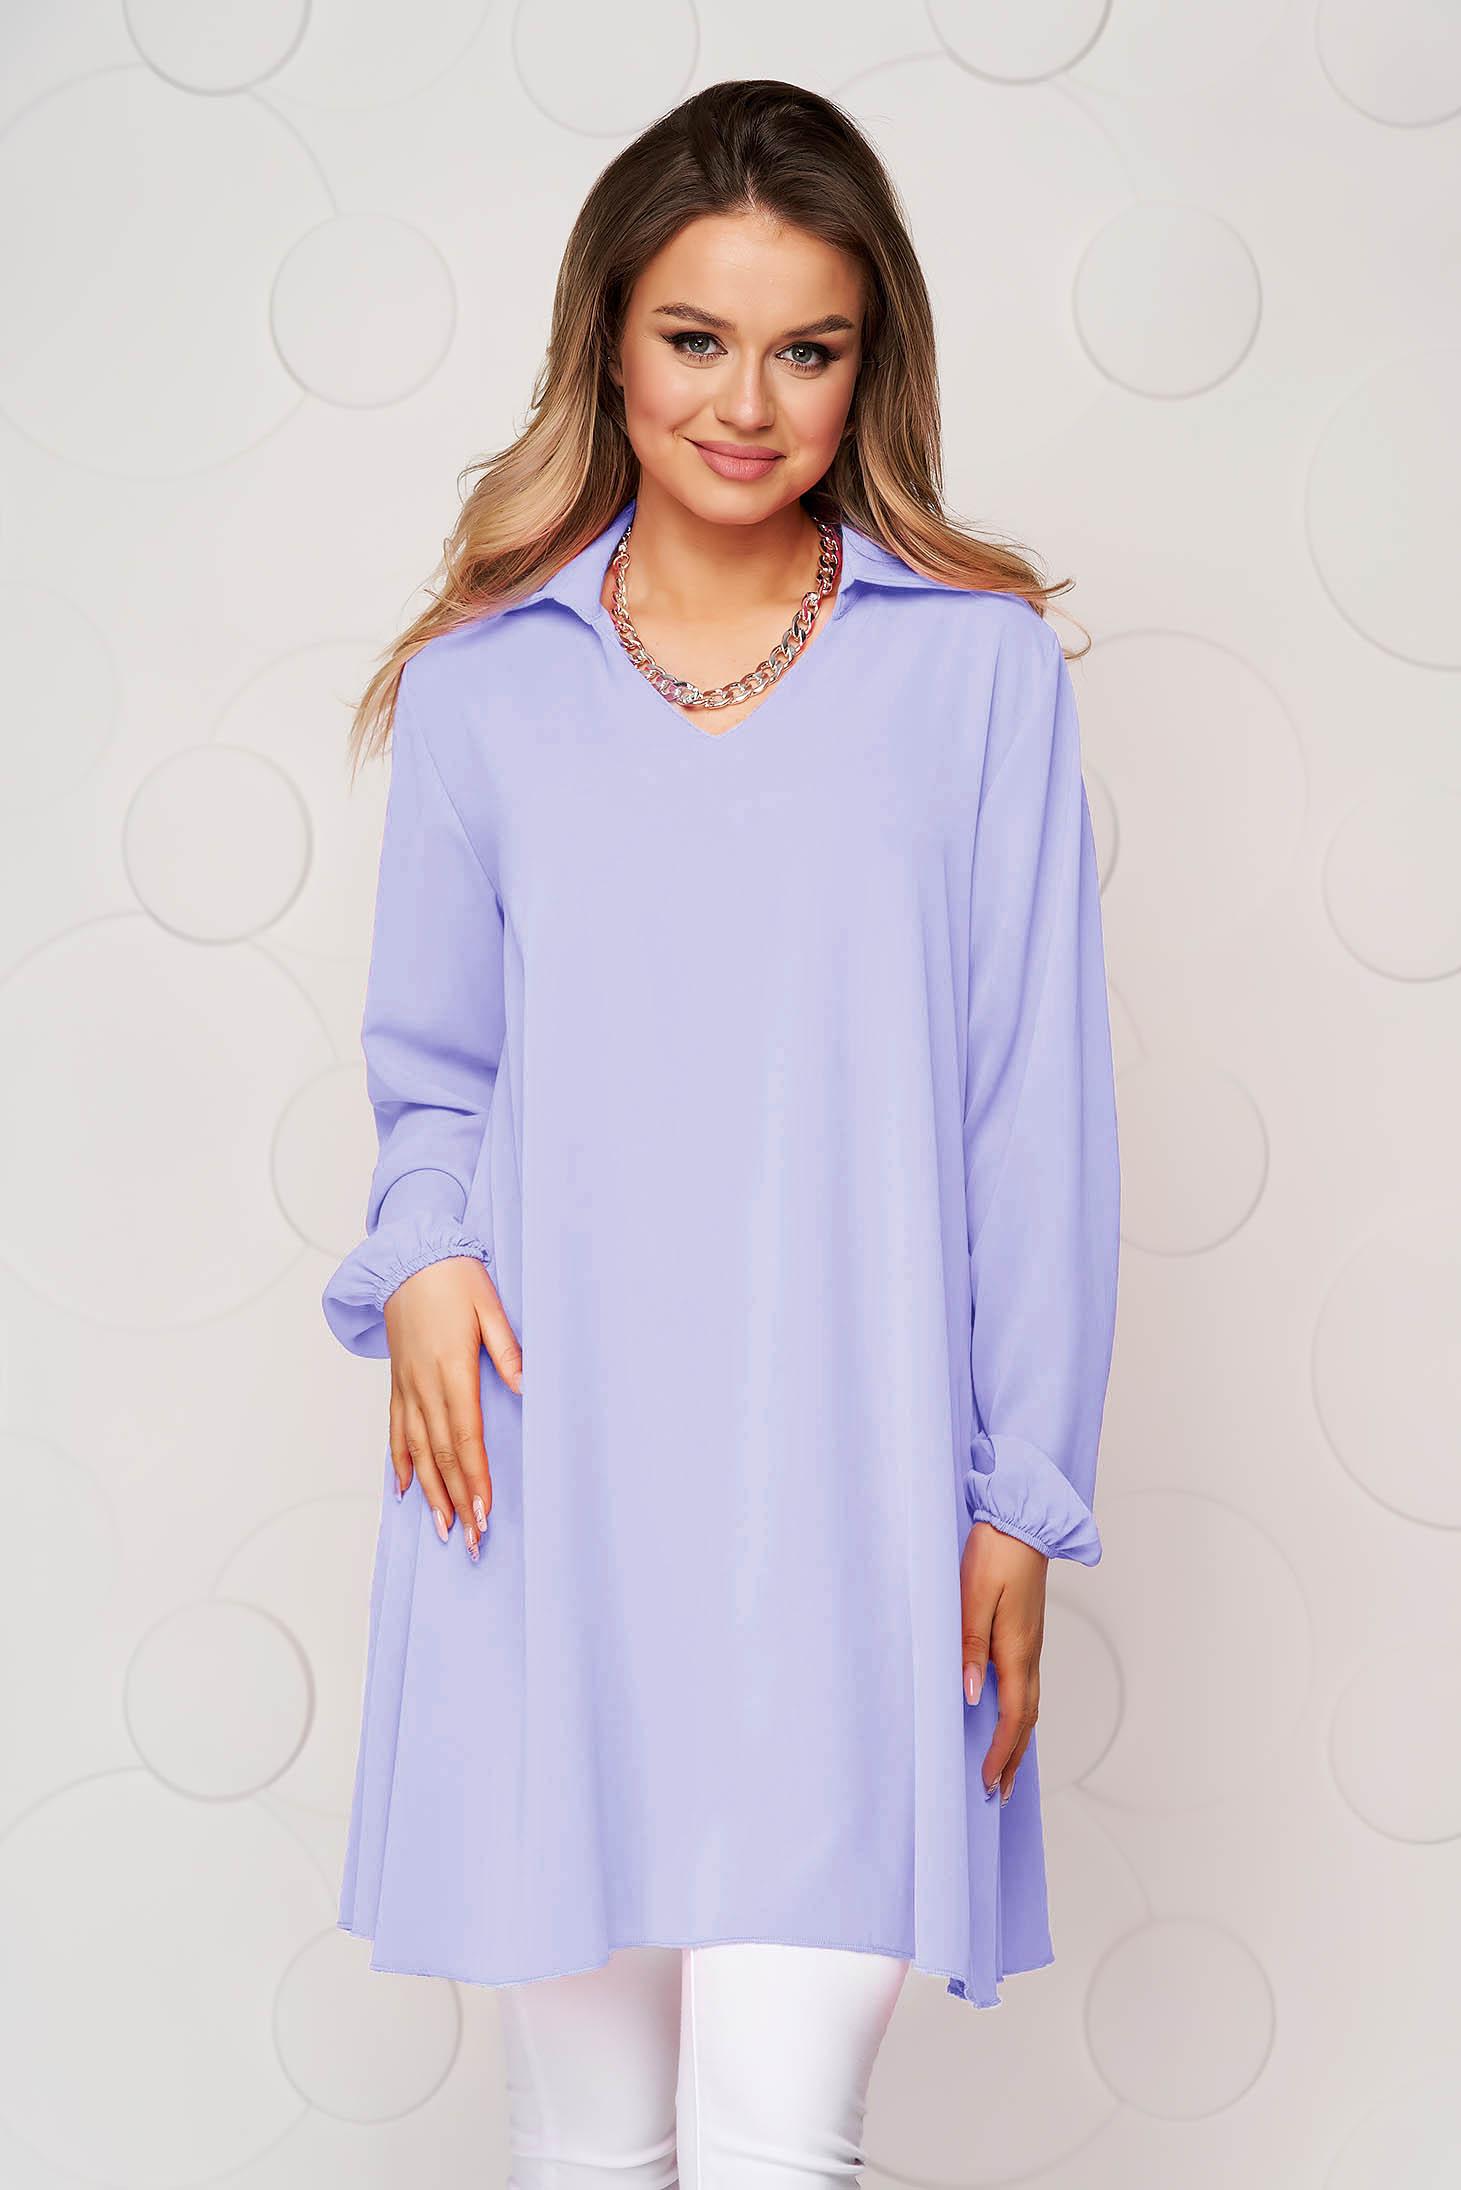 Bluza dama SunShine lila cu croi larg din material vaporos si transparent cu maneca lunga